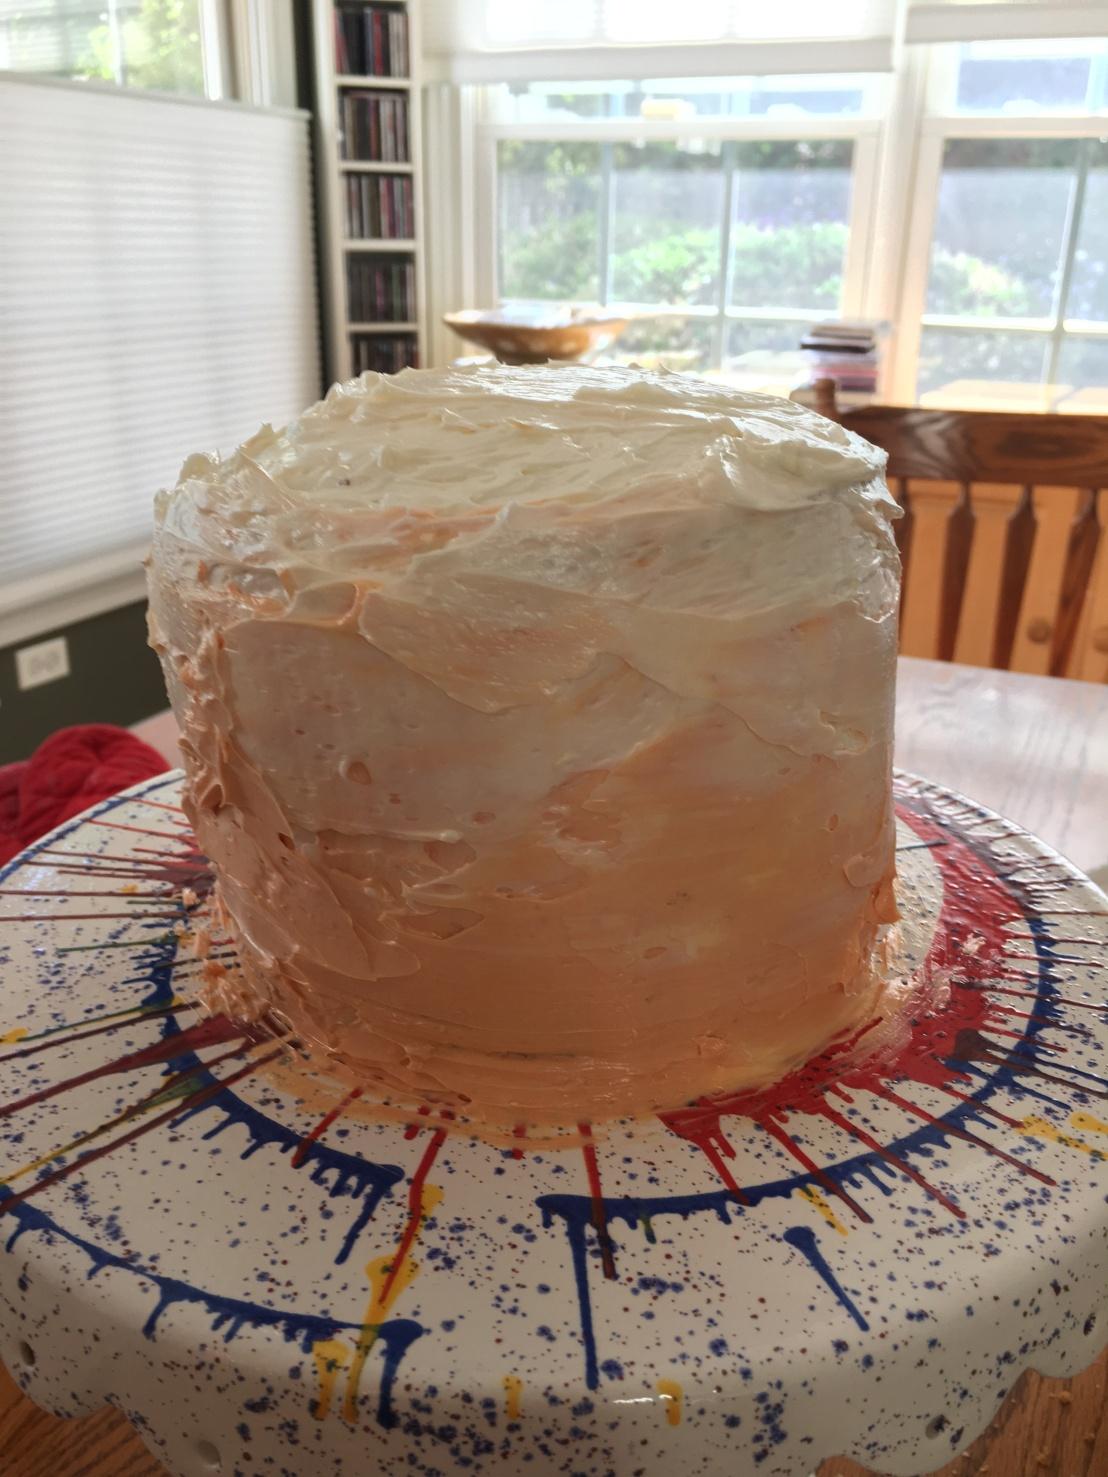 Adventures in Baking No. 2: Sweet TeaCake